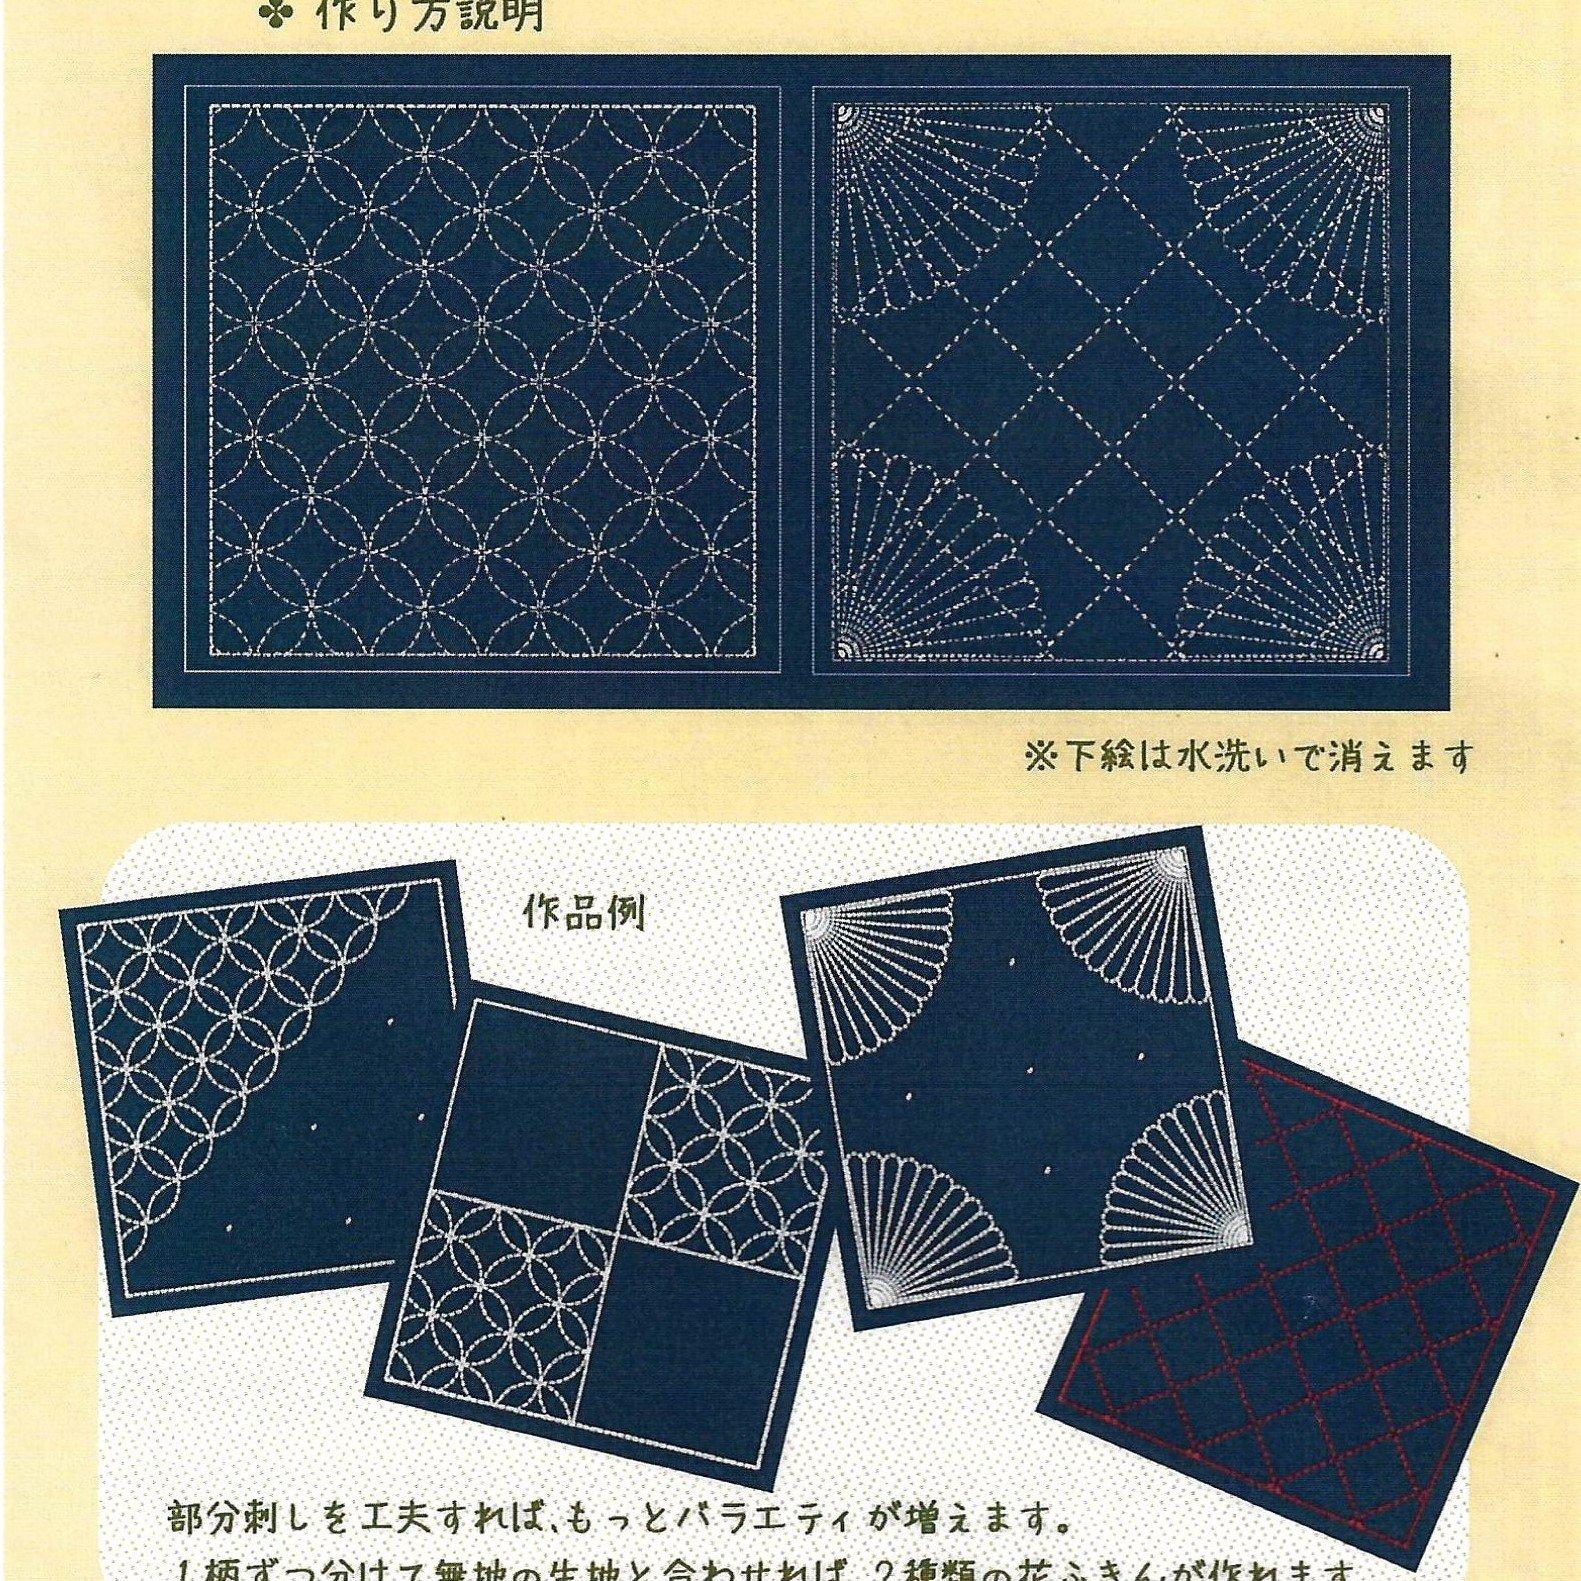 OI Double Sashiko Pre-printed Indigo Cloth SW380-4A - Seven Treasures and Chrysanthemums